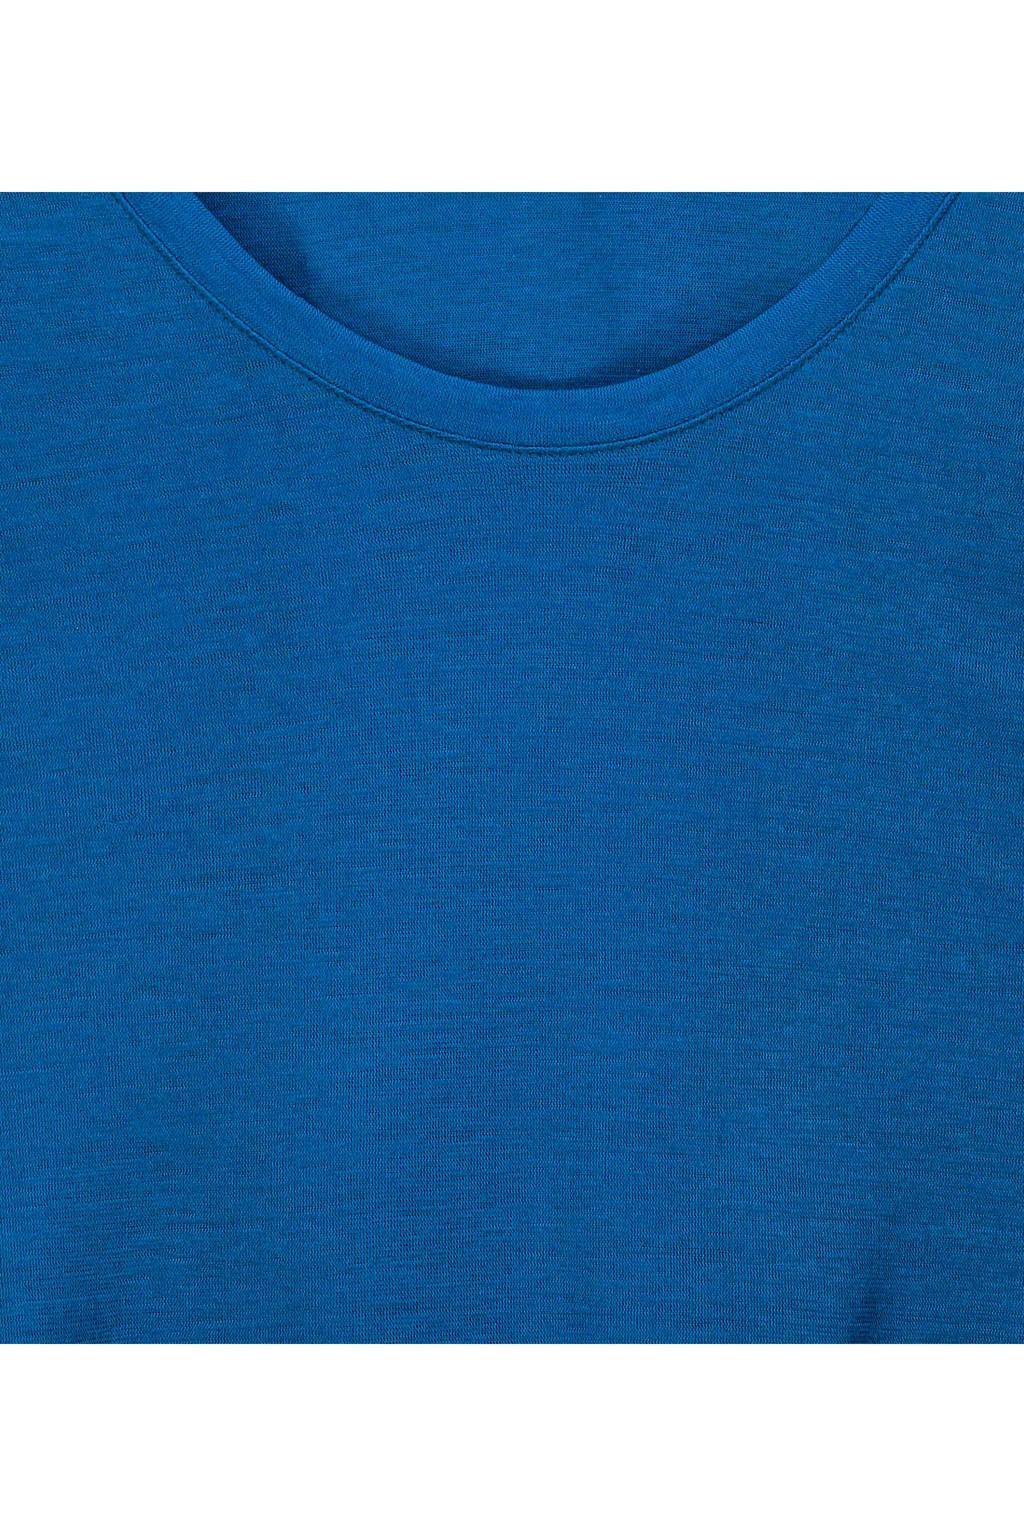 Blauw Cksengy shirt Blauw shirt Cksengy T T T Cksengy shirt 1qxPwTZf